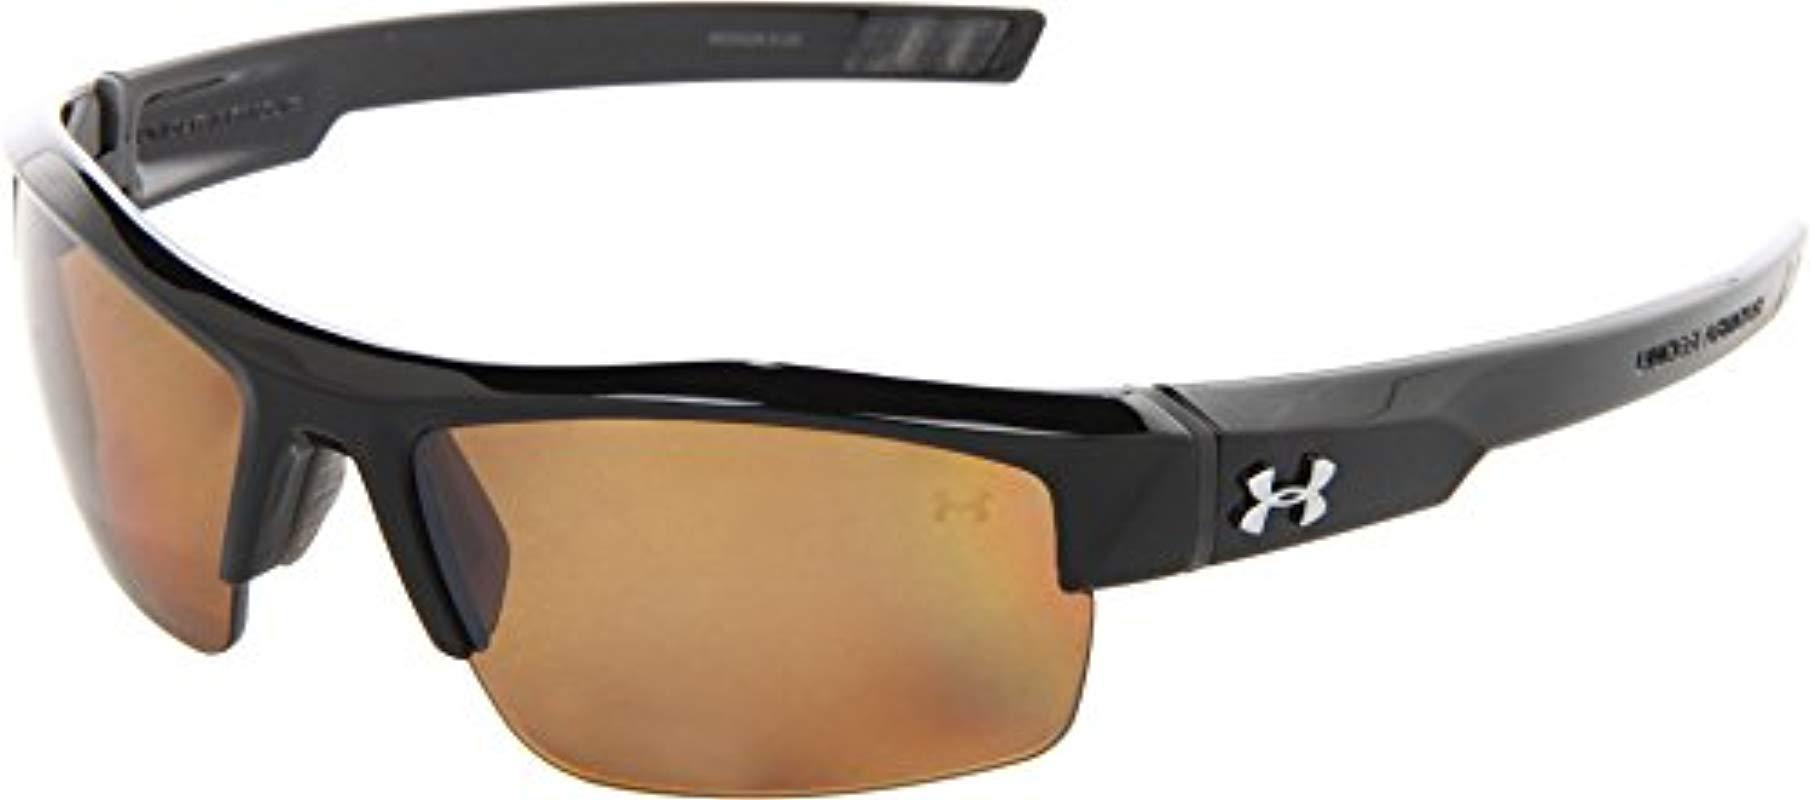 4054af118e Under Armour. Women s Black Igniter Polarized Multiflection Sunglasses